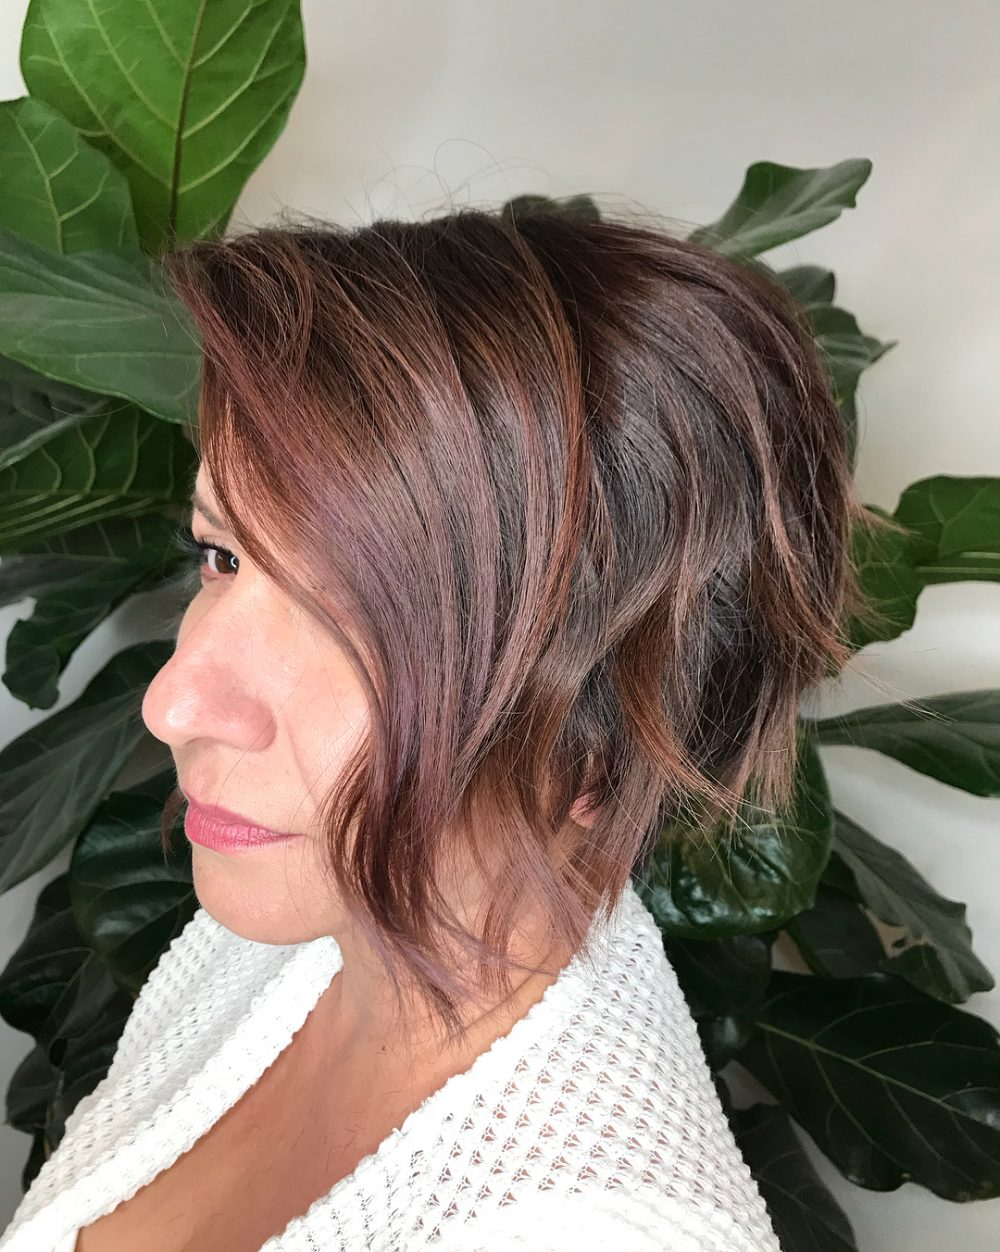 Undone Texture hairstyle